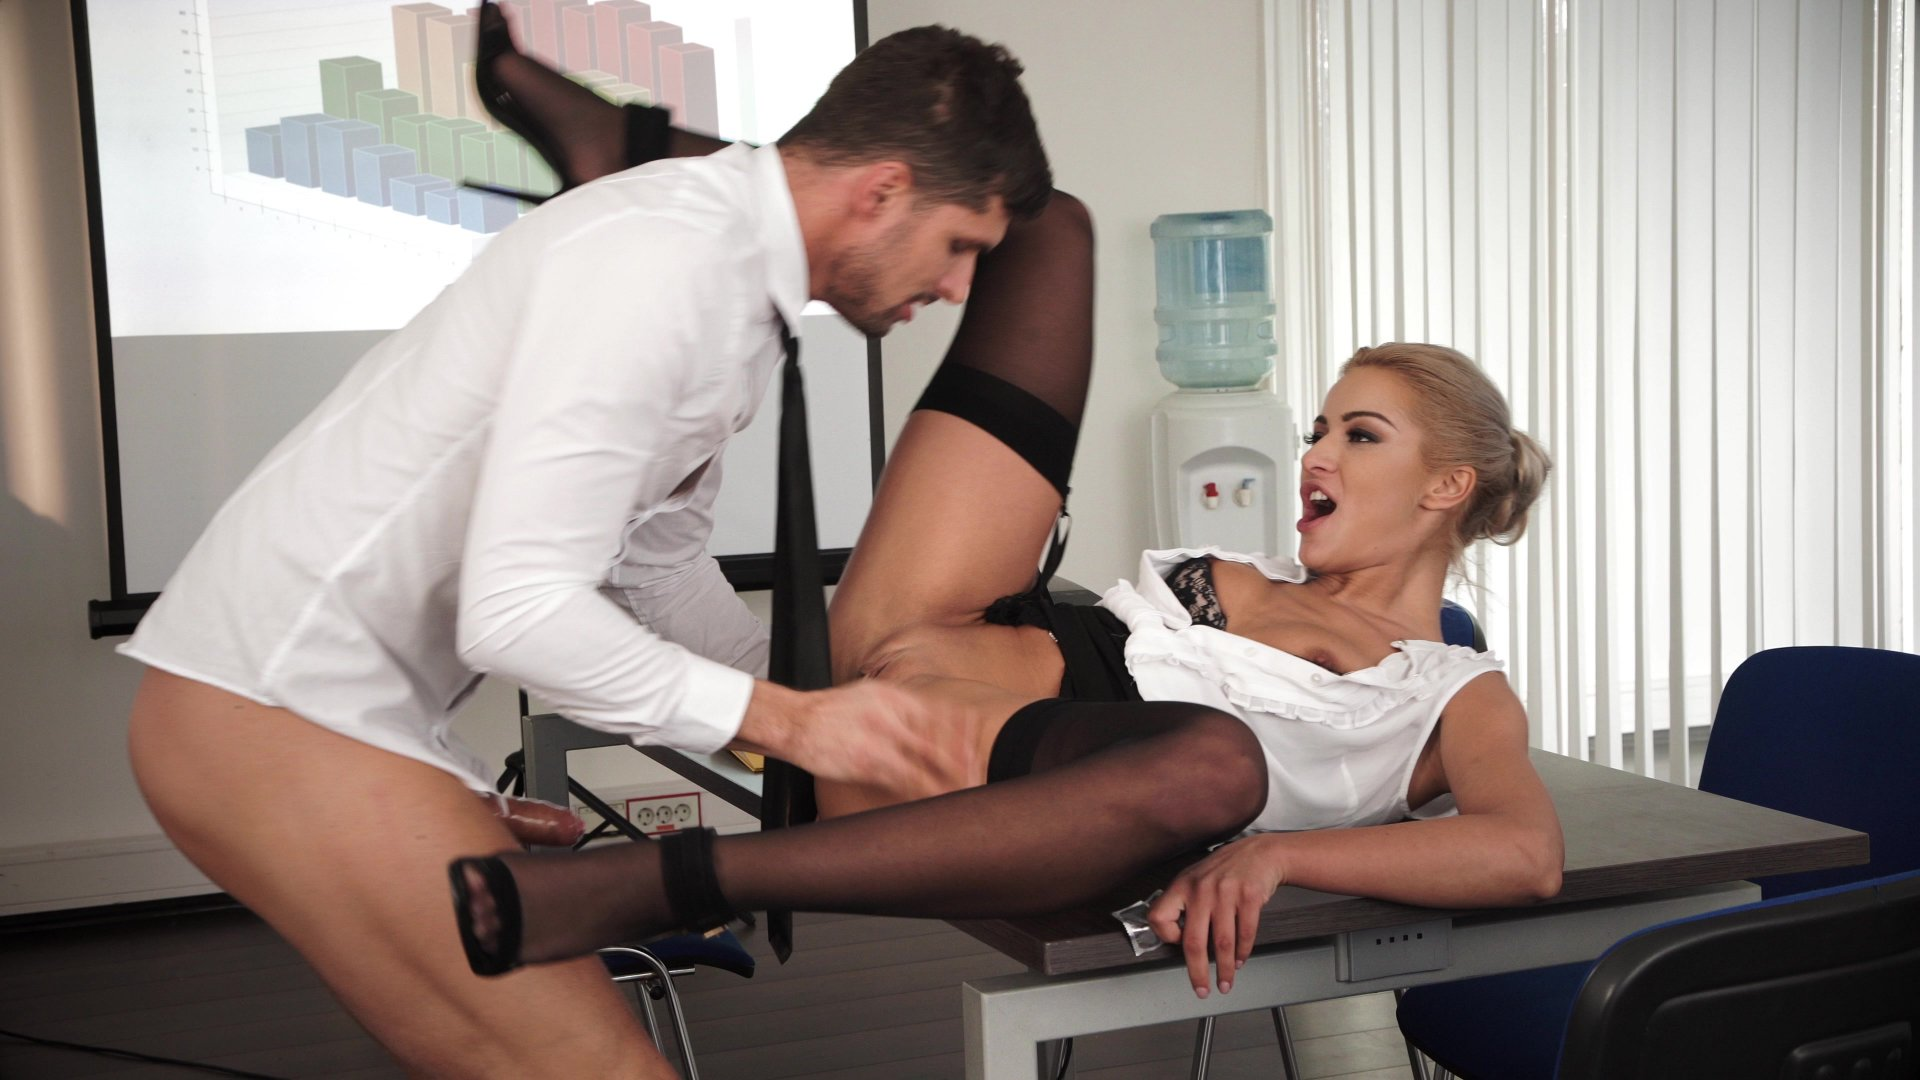 corporate-sex-fantasy-videos-office-sex